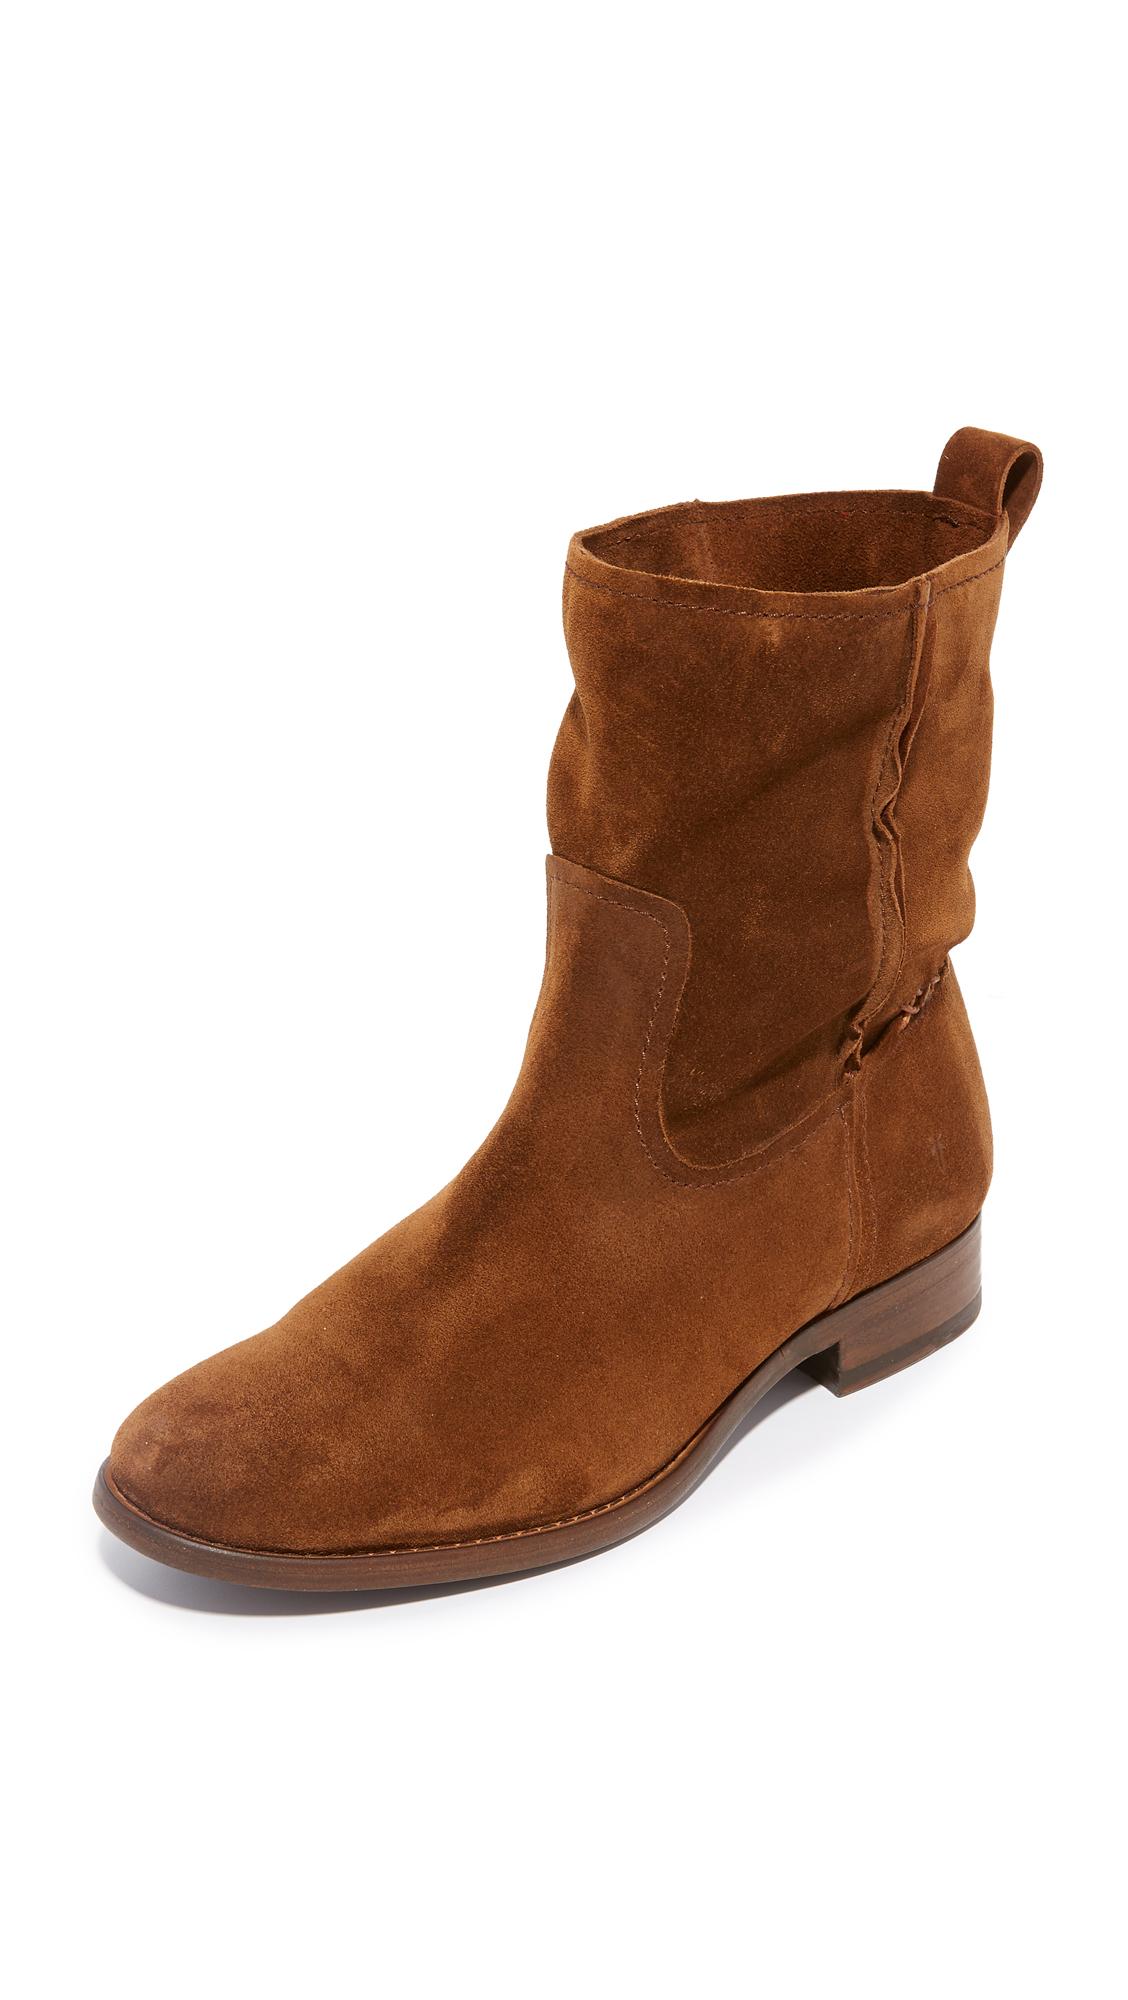 Frye Cara Short Boots - Wood